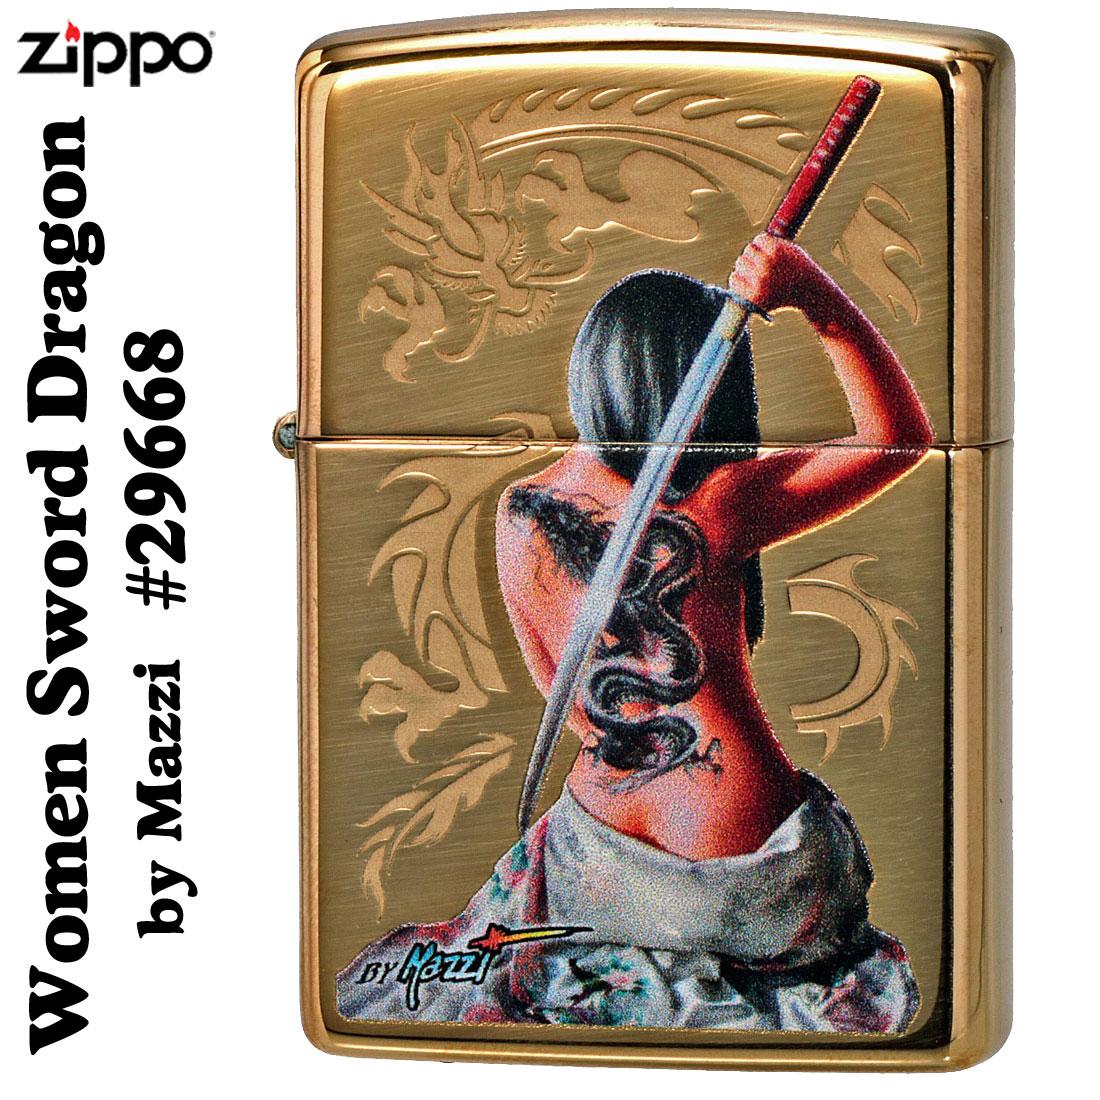 zippo(ジッポーライター)Women Sword Dragon by Mazzzi ハイポリッシュブラス #29668画像